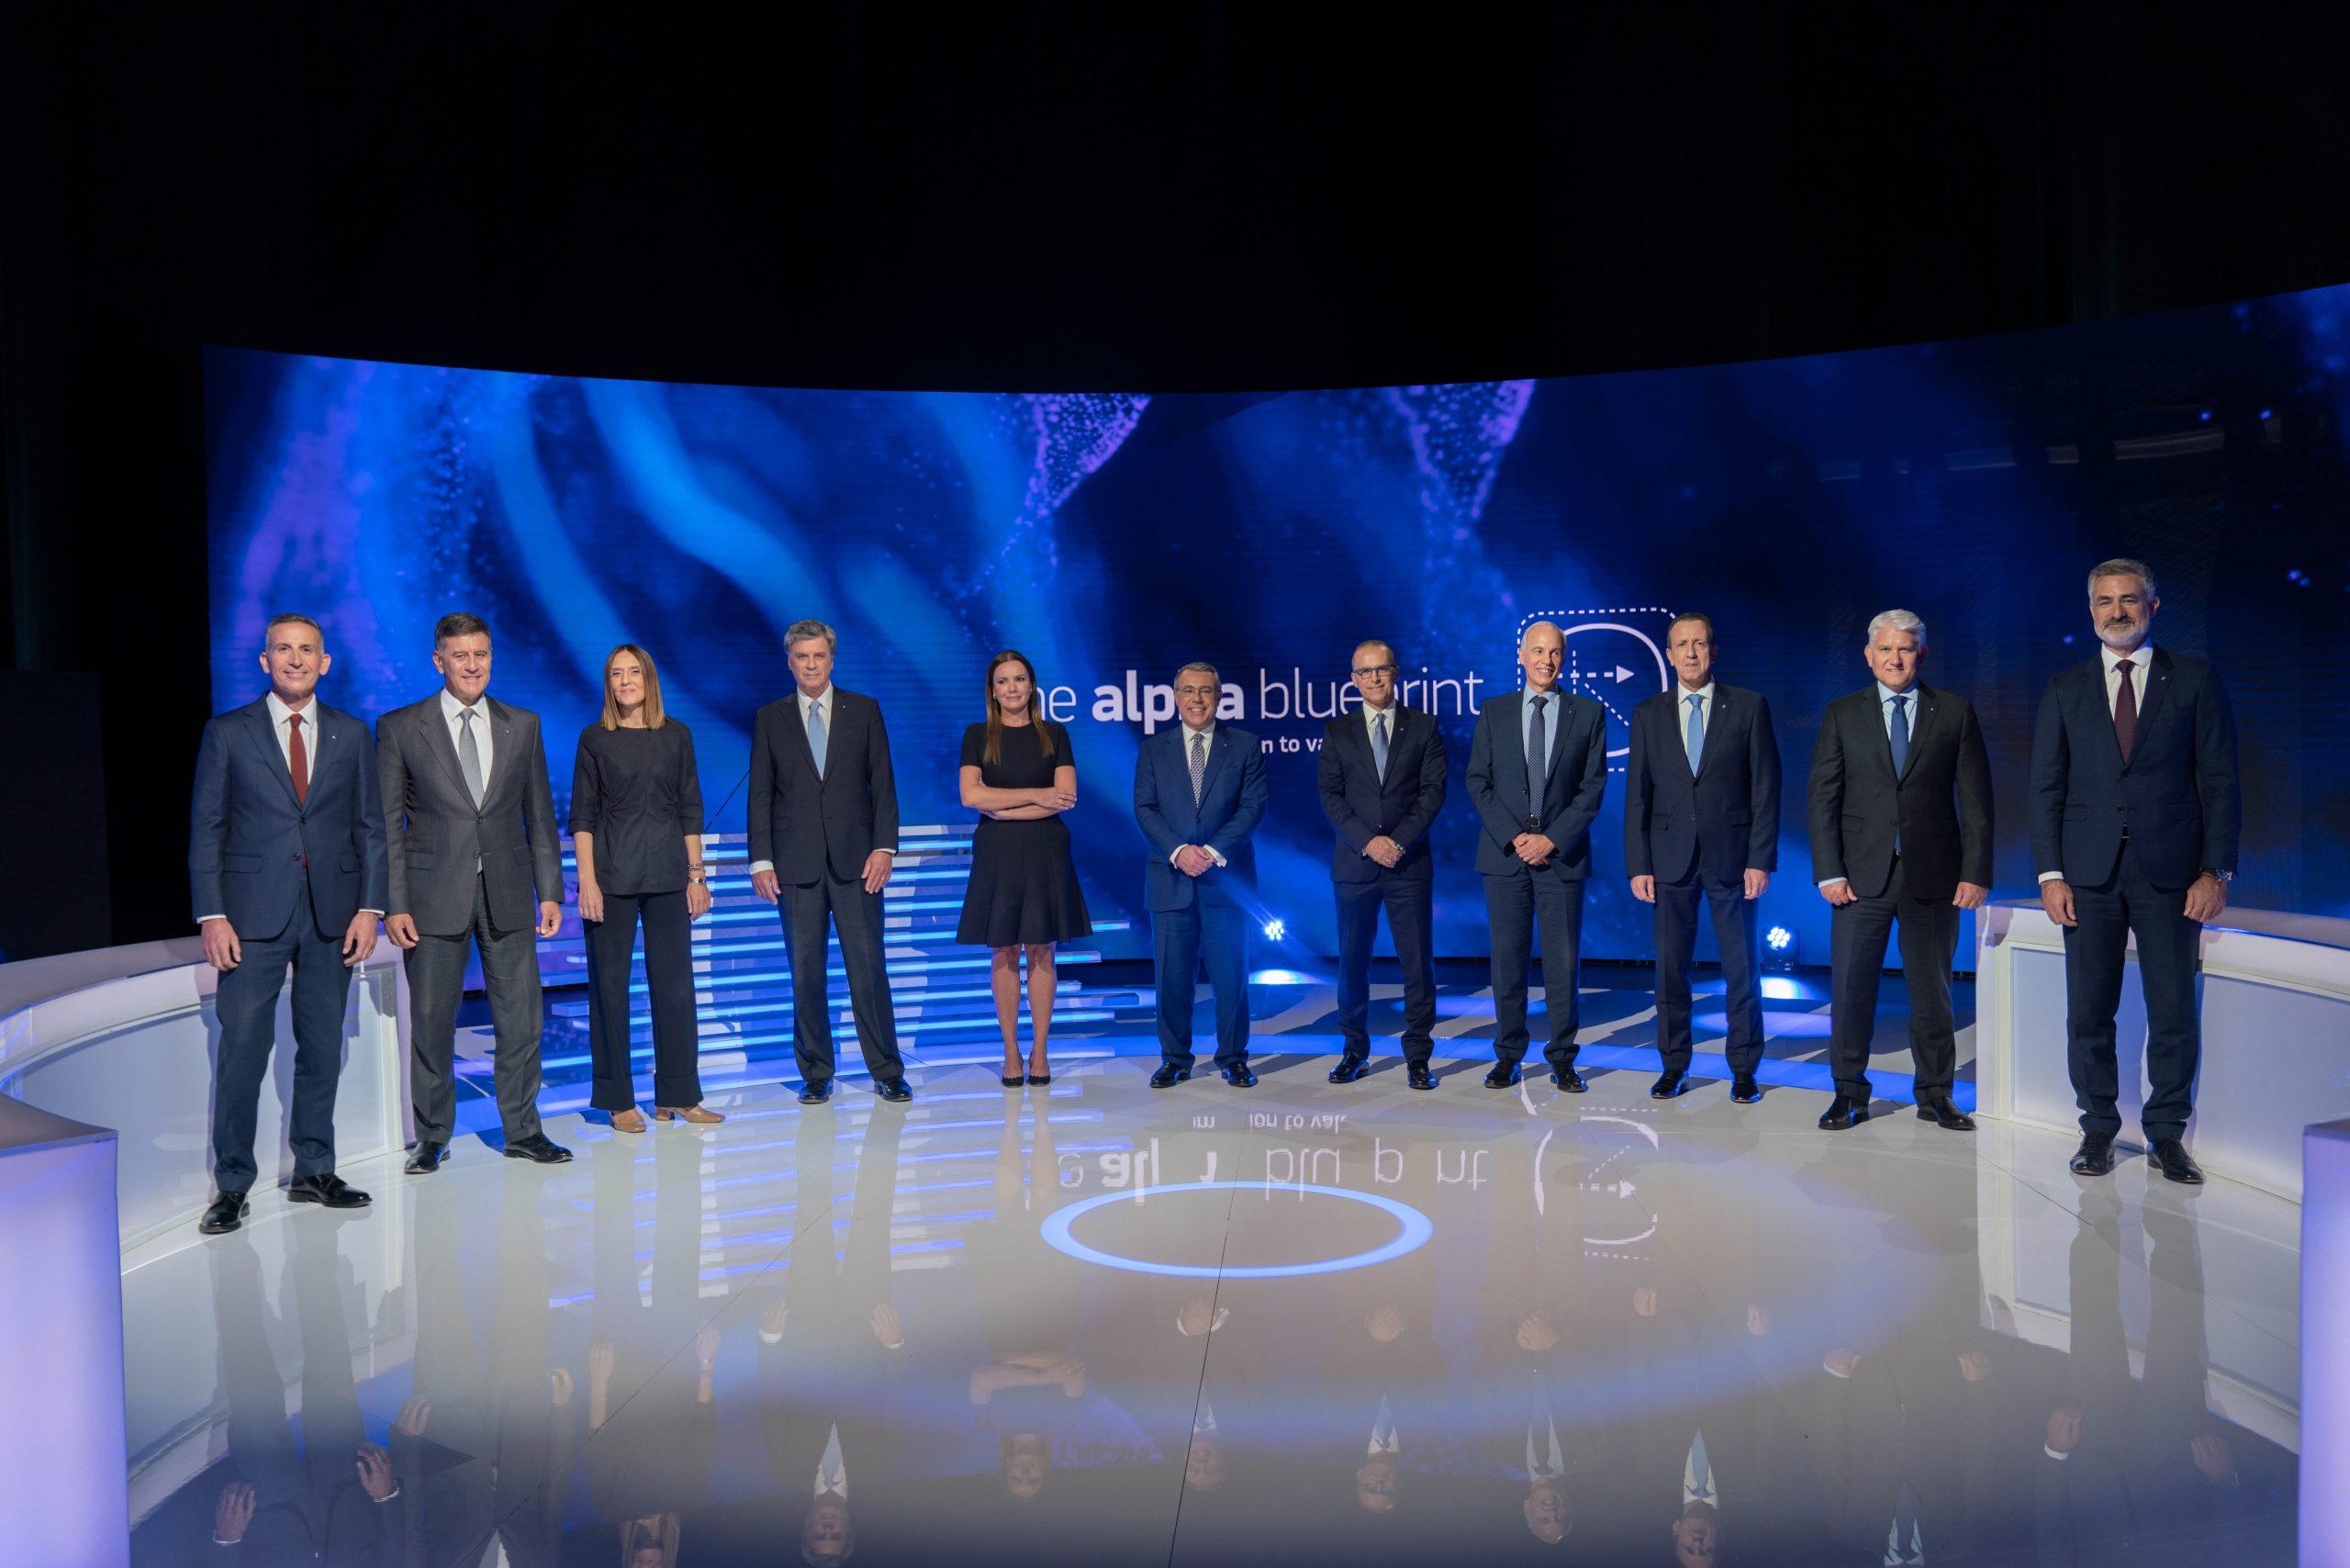 ALPHA BANK: the alpha blueprint: «Μαζί δημιουργούμε την Alpha Bank του Αύριο»